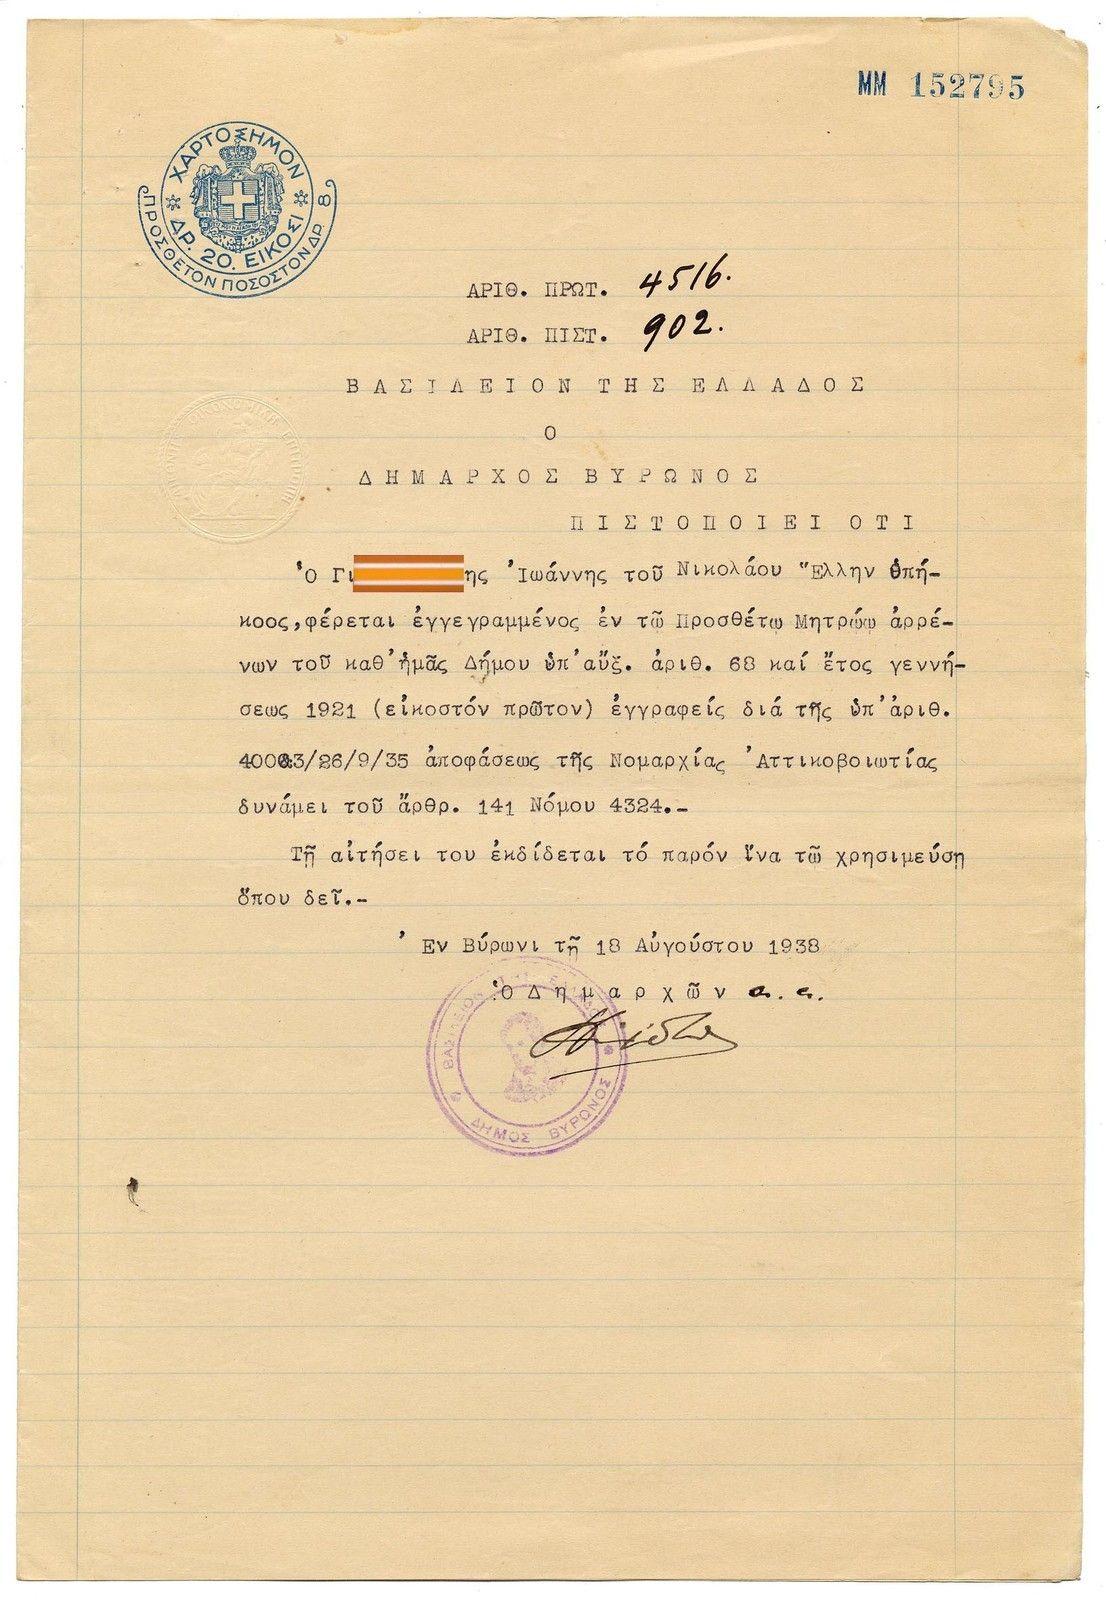 9507 greece byron attica 1938 document birth certificate ebay 9507 greece byron attica 1938 document birth certificate ebay 1betcityfo Gallery